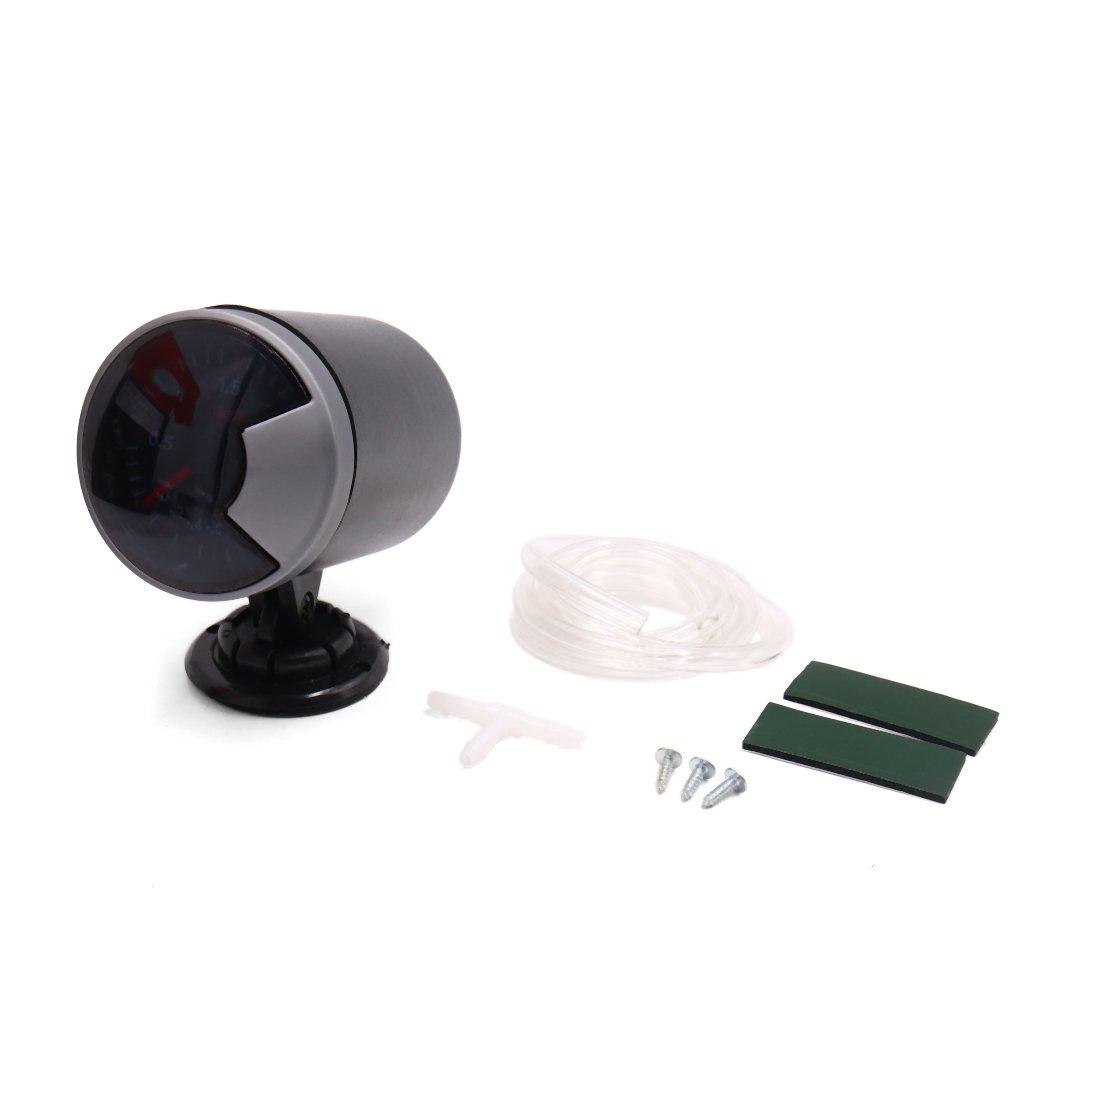 uxcell -1 to 2 Bar 2.7'' 68mm Dia LED Light Car Pointer Oil Pressure Gauge Meter w Bracket